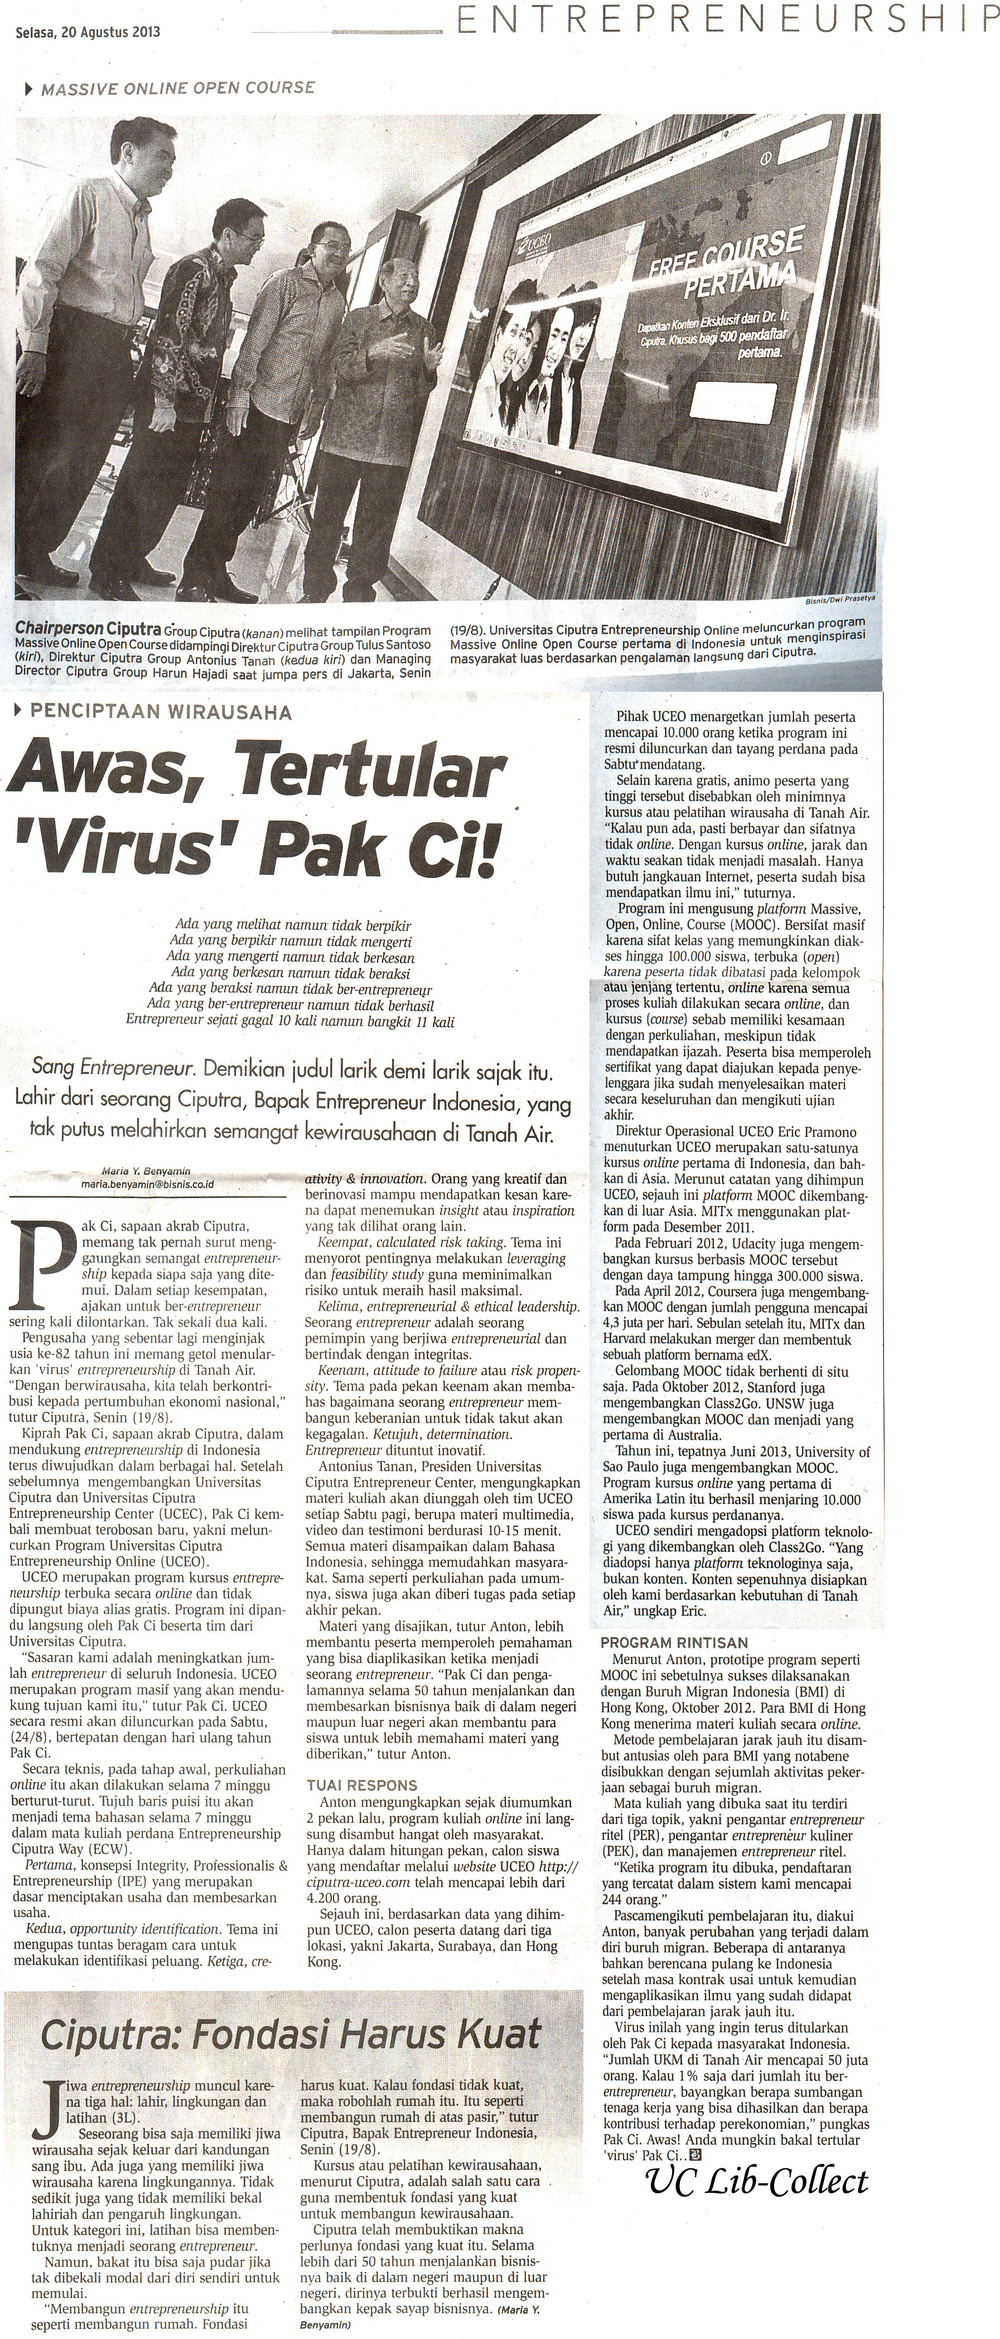 Awas Tertular Virus Pak Ci.Bisnis Indonesia.20 Agustus 2013.Hal.27.jpg